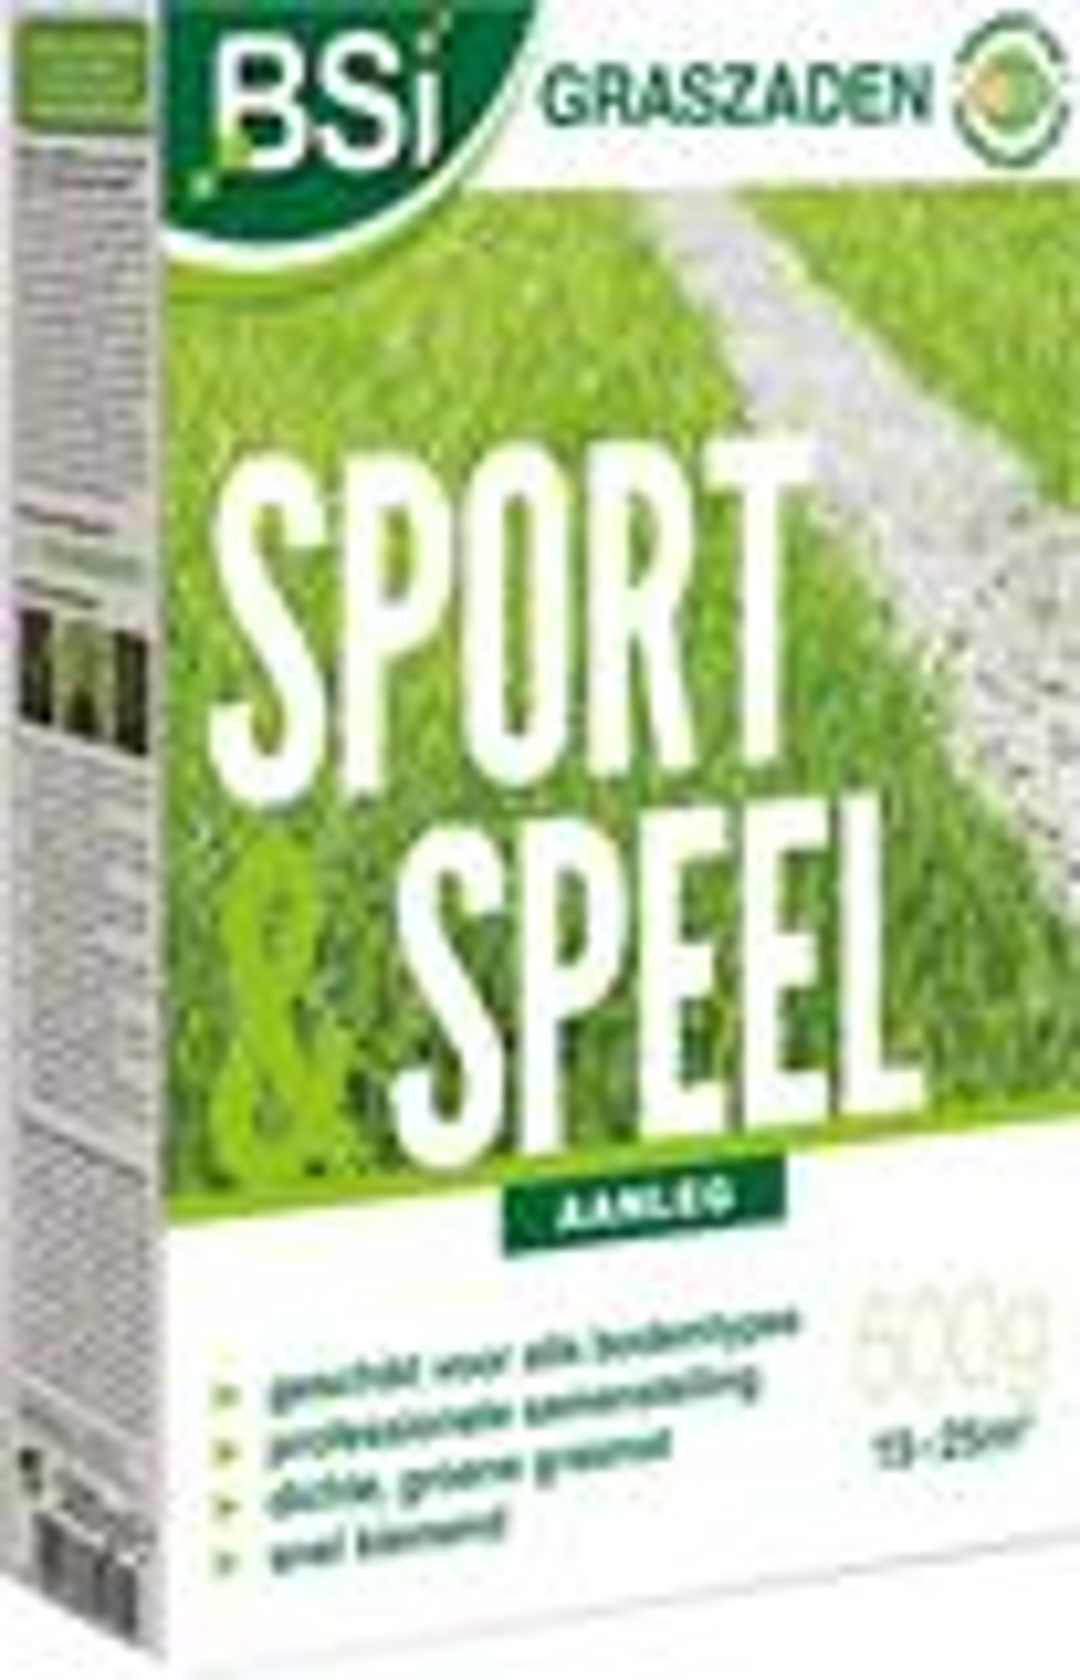 Graszaad BSI Sport en Speel 500gr